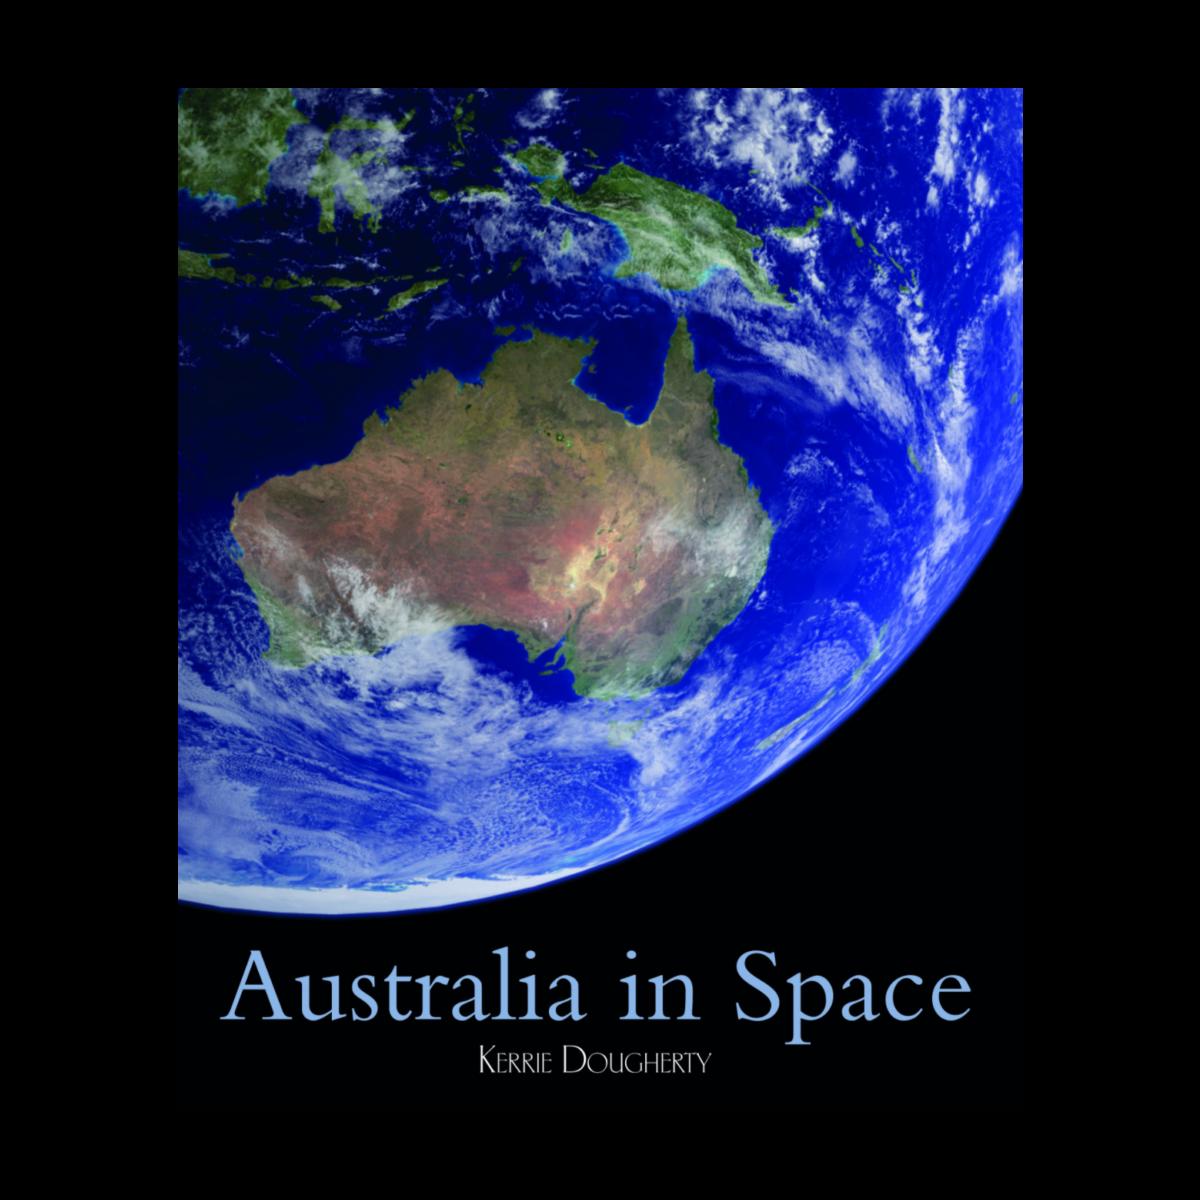 Australiainspace